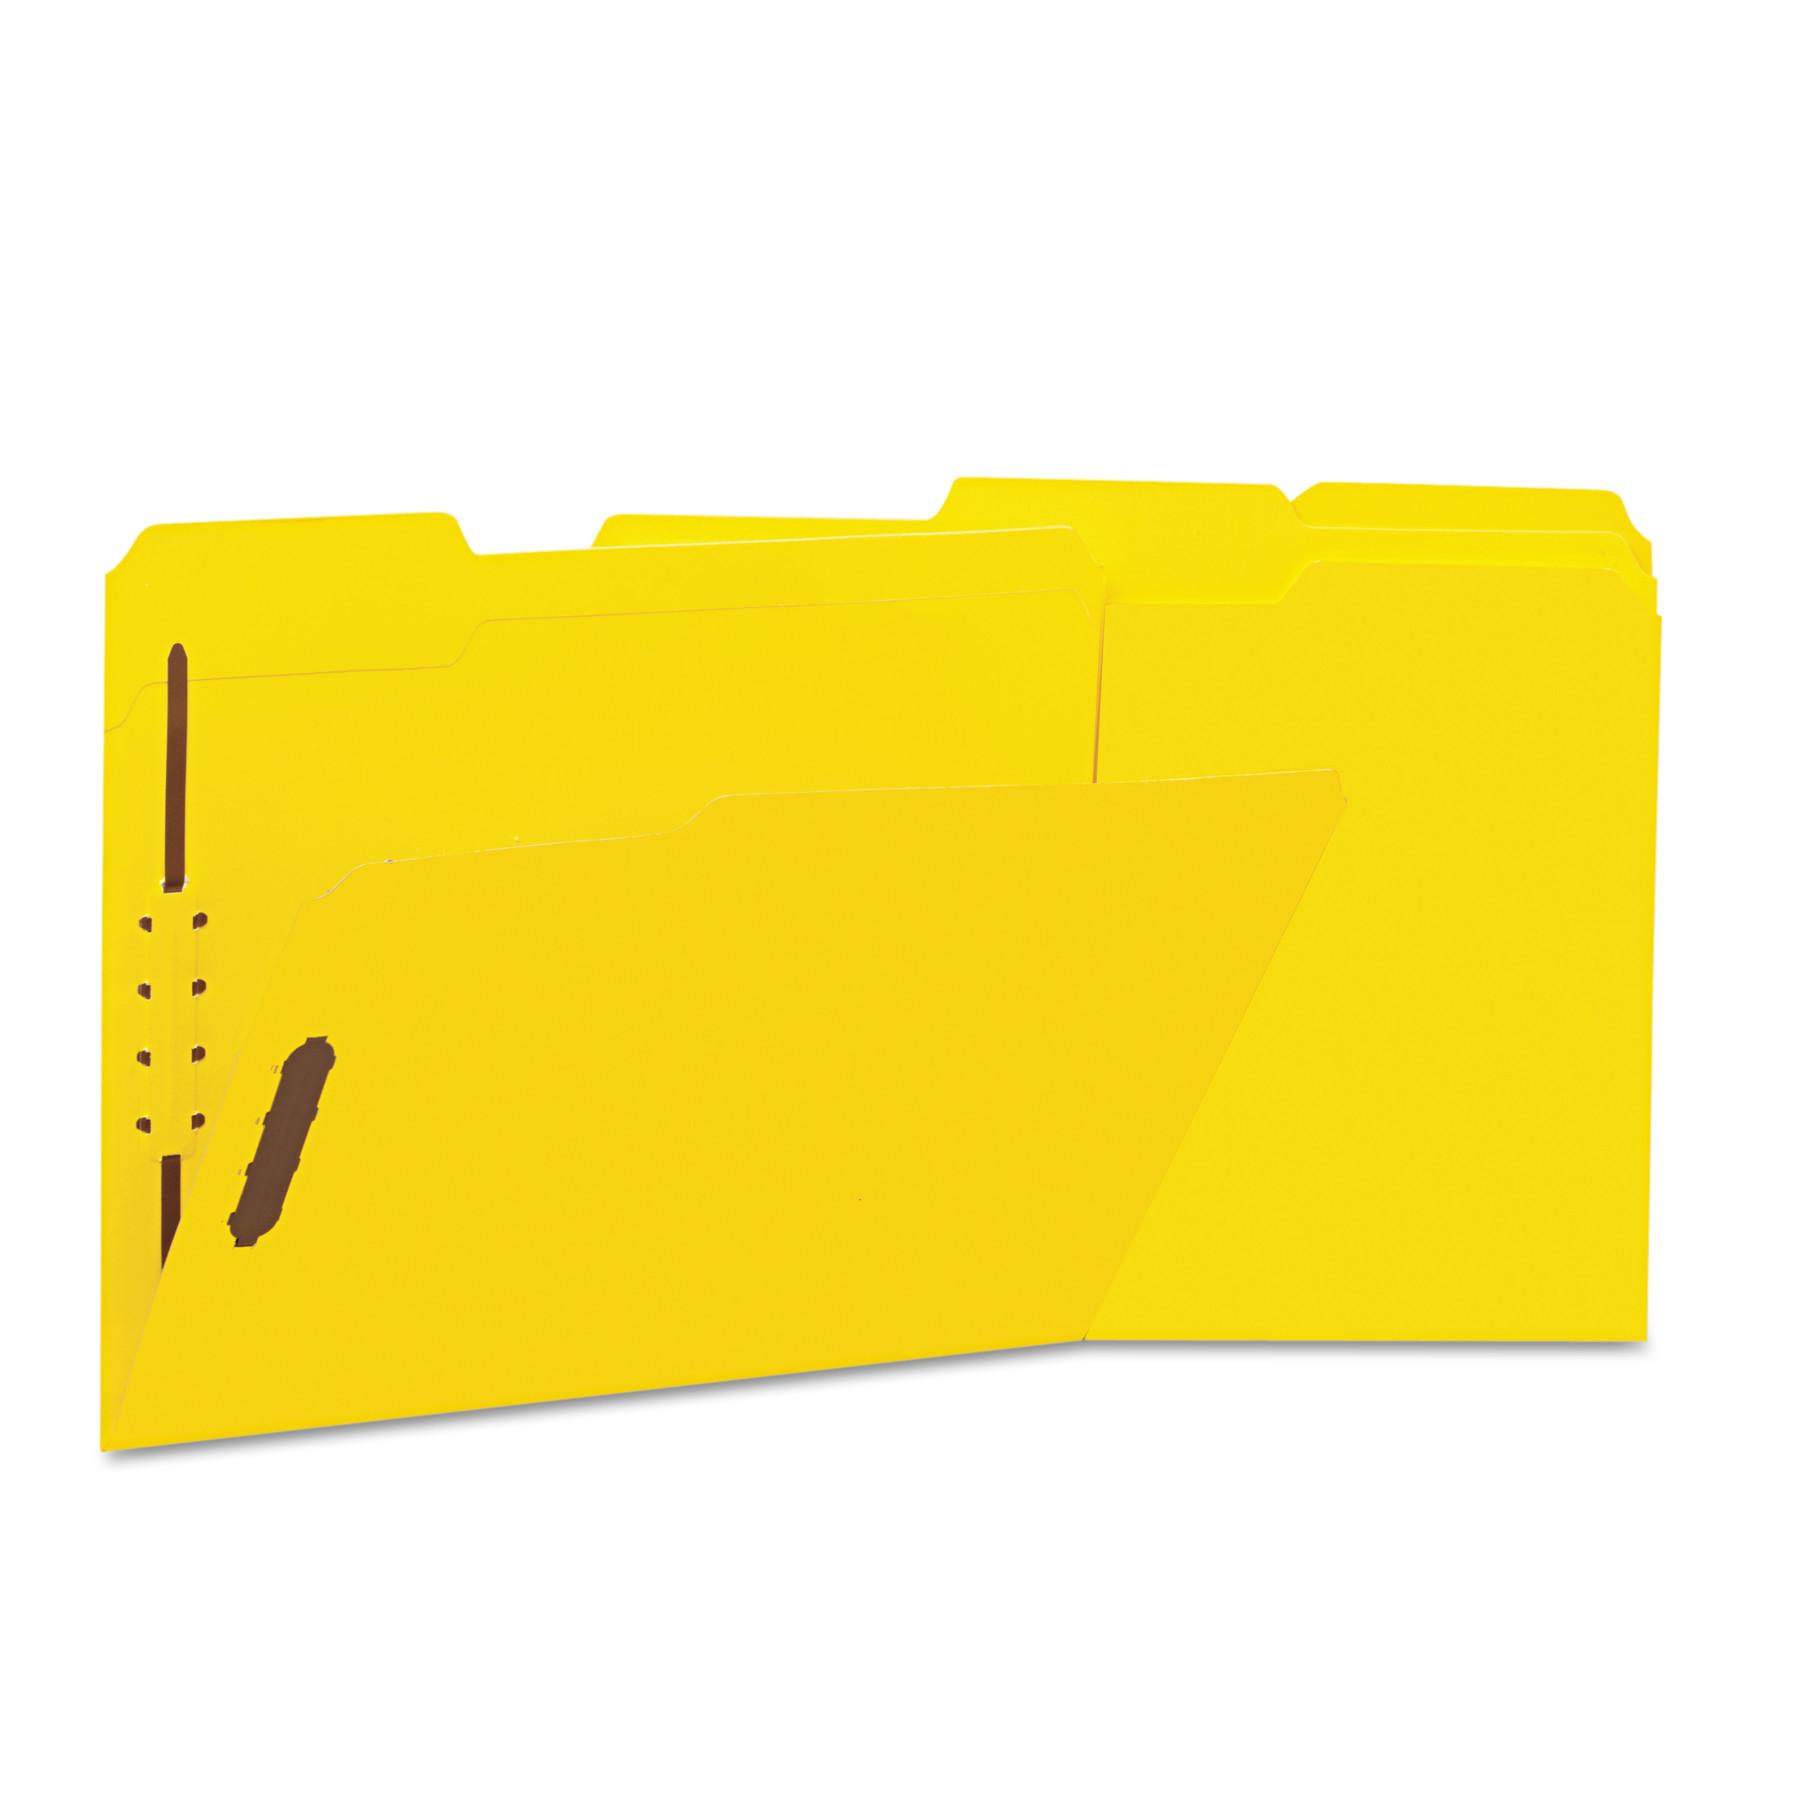 Deluxe Reinforced Top Tab Folders, 2 Fasteners, 1/3 Tab, Letter, Yellow, 50/Box